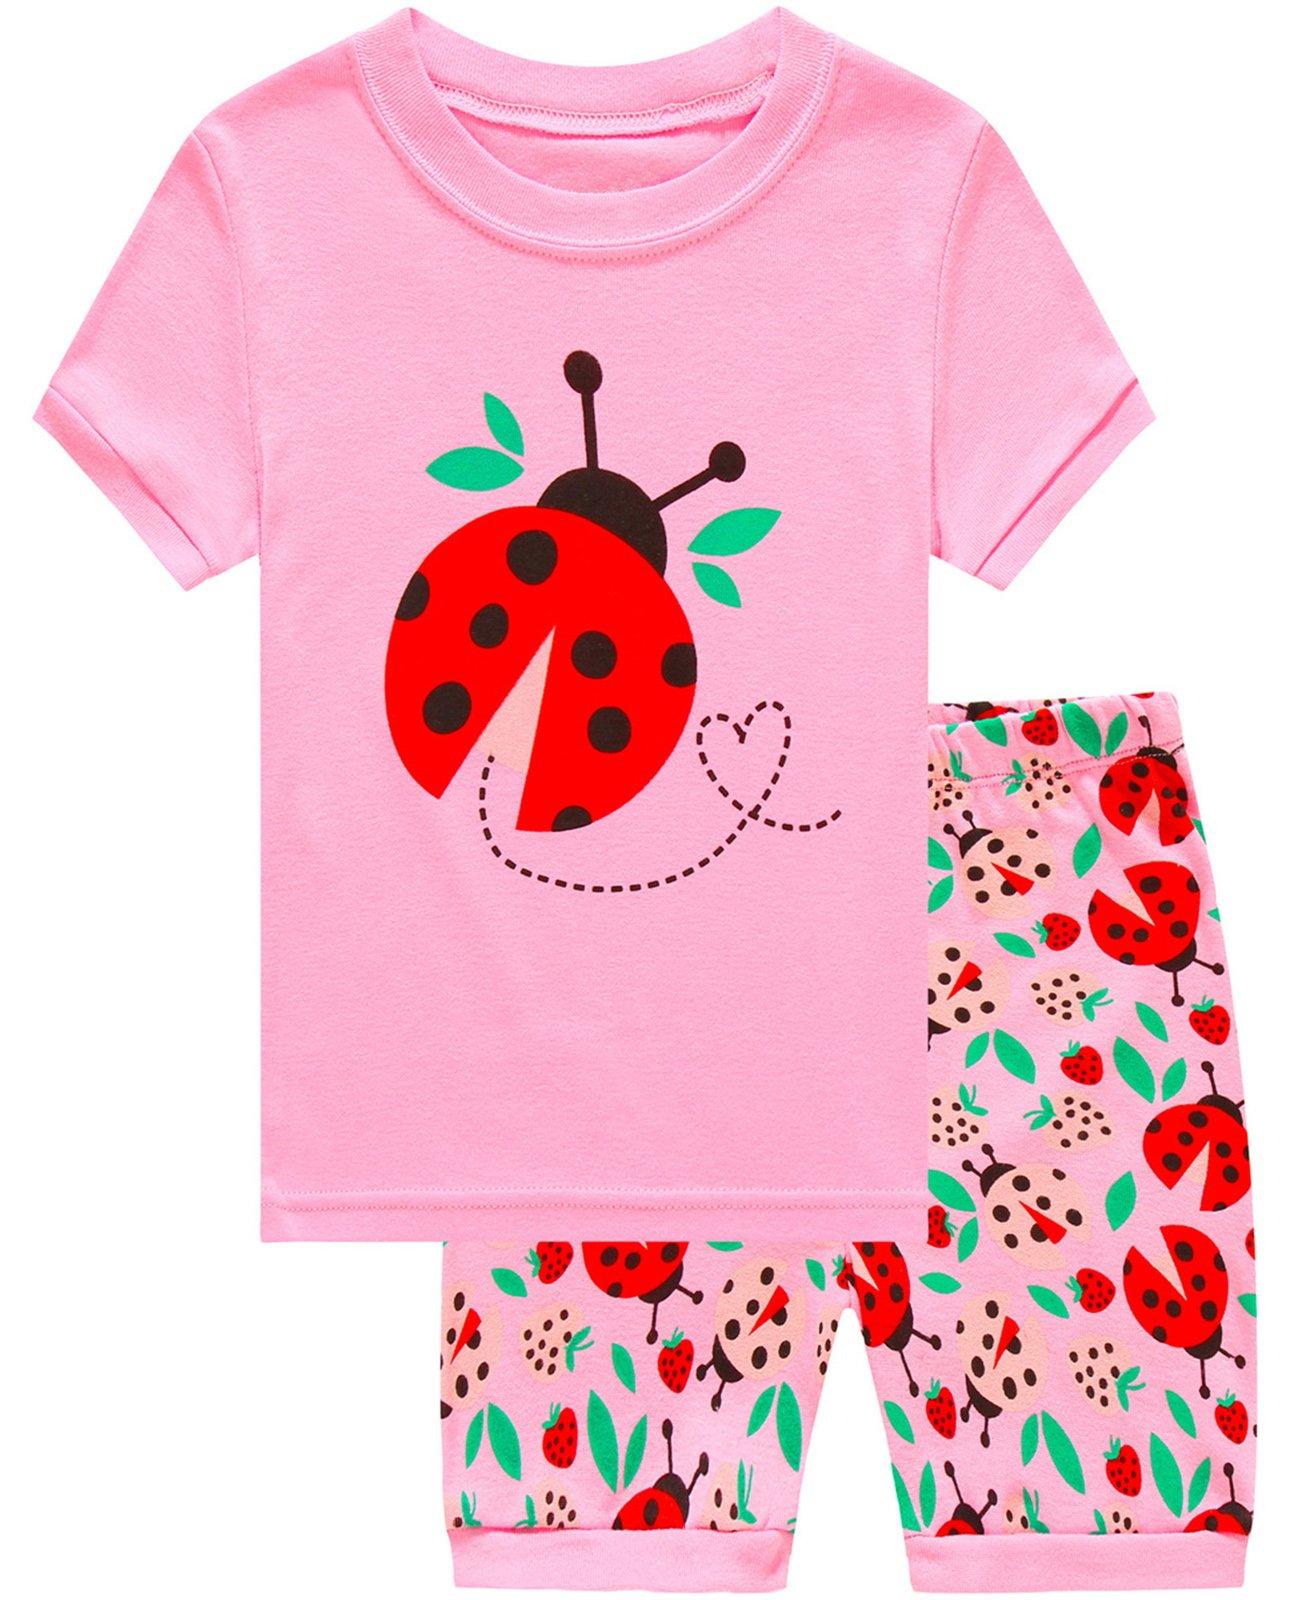 Babyroom Girls Short Pajamas Toddler Kids Pjs 100% Cotton Sleepwear Summer Clothes Shirts 3T